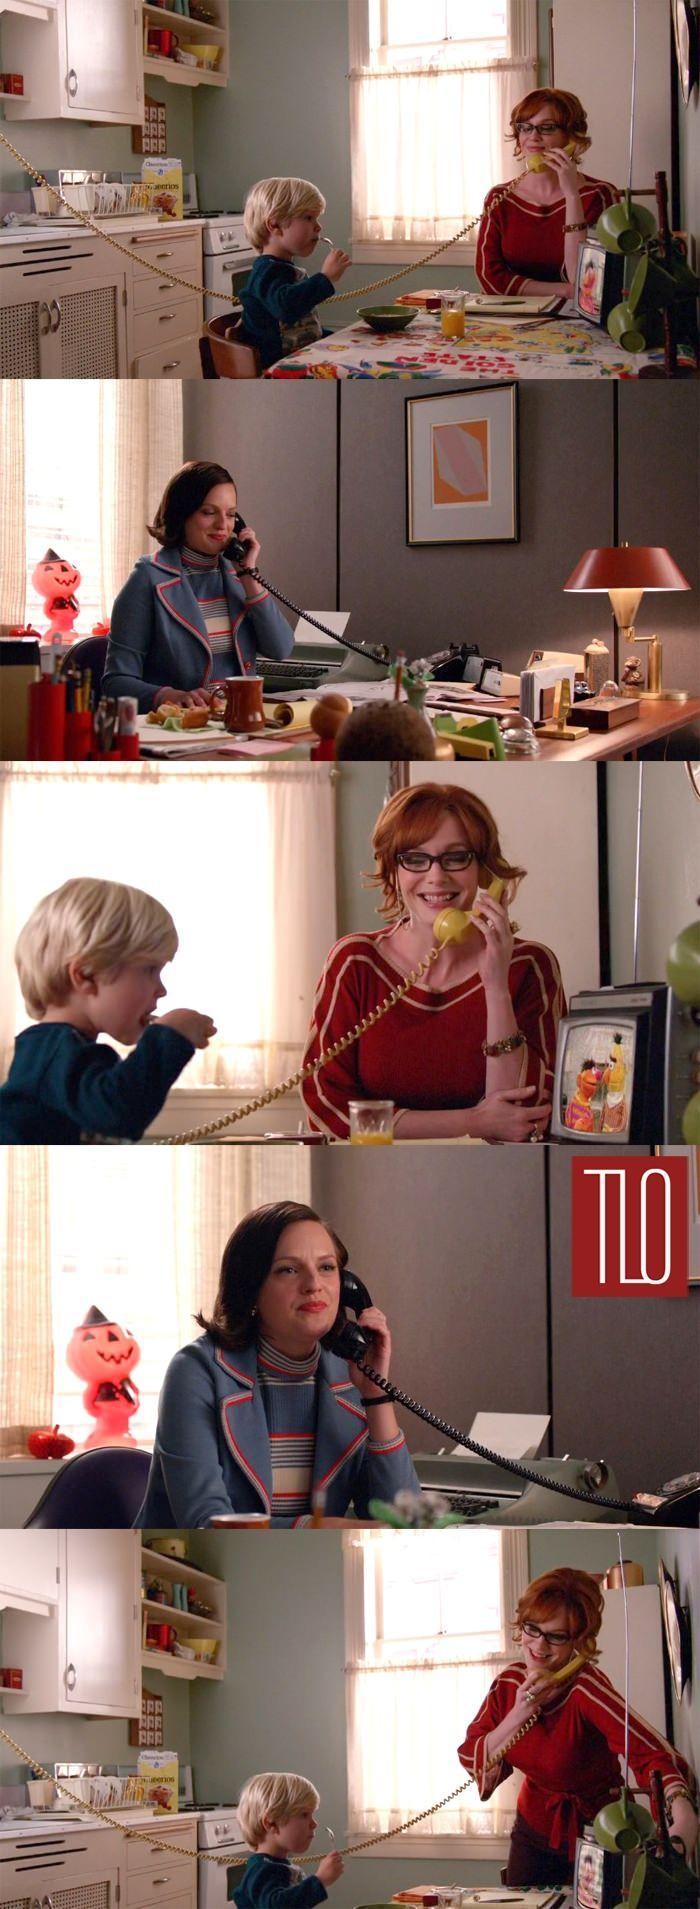 Mad-Men-Season-7-Finale-Mad-Style-Costumes-Television-Tom-Lorenzo-Site-TLO (13)